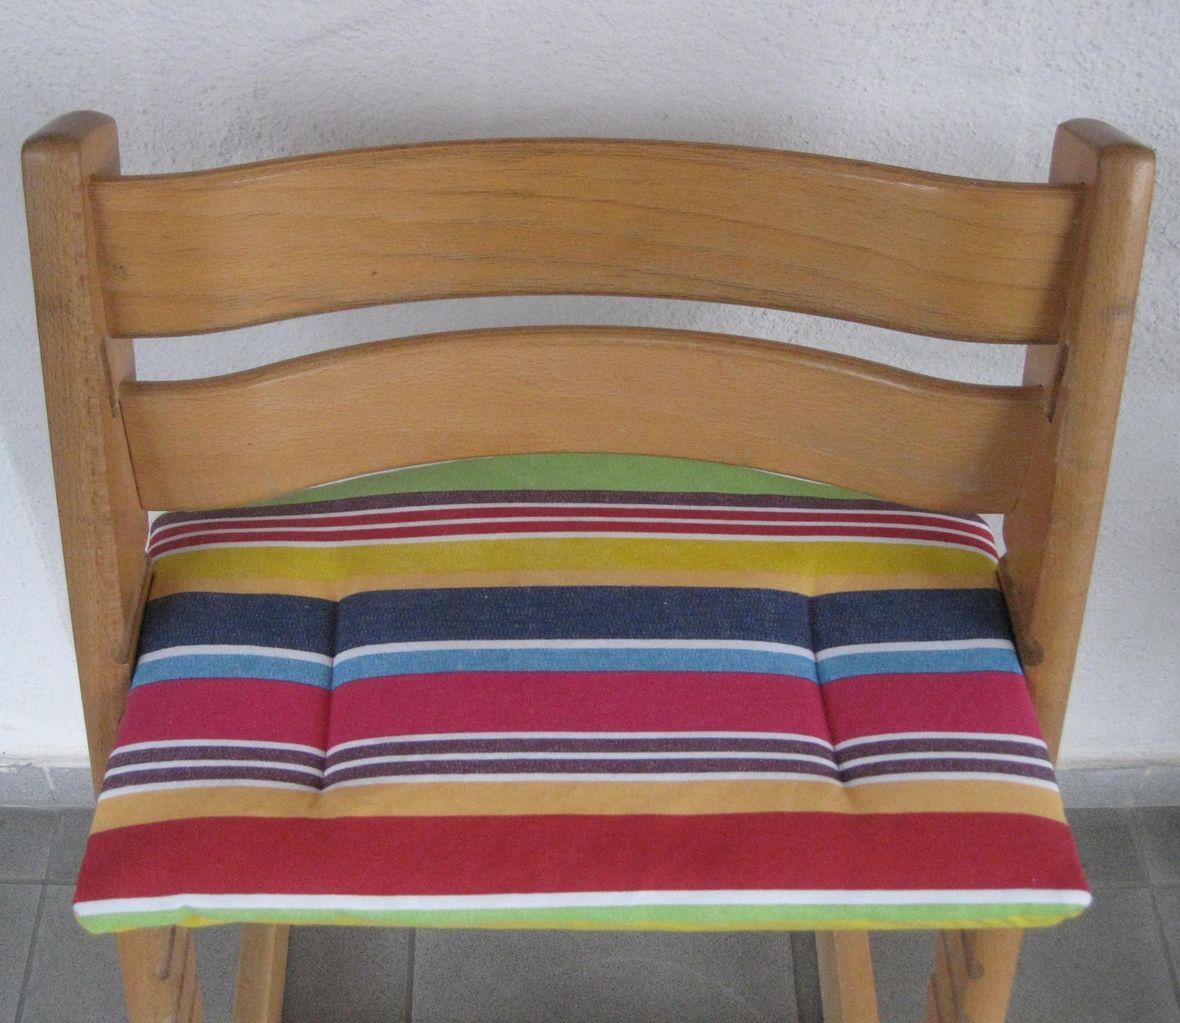 sitzkissen sitzpolster sitzbezug f r tripp trapp stokke hauck leander treppy. Black Bedroom Furniture Sets. Home Design Ideas